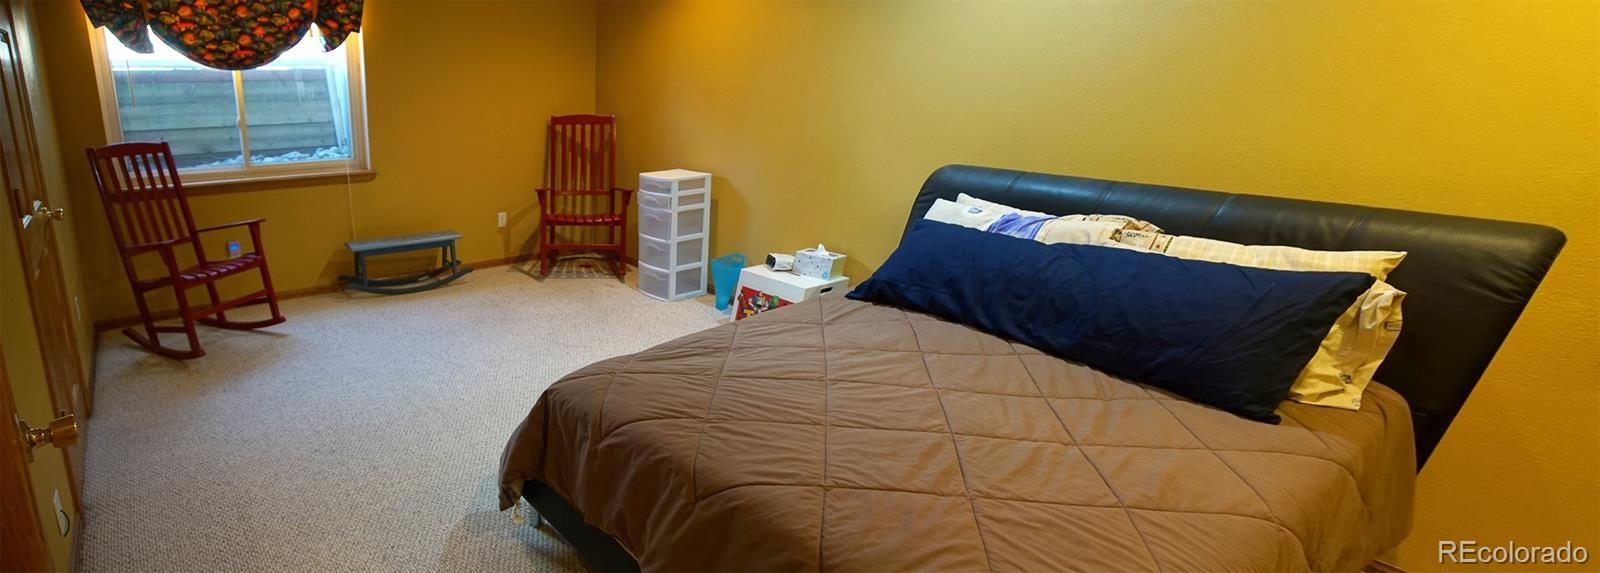 MLS# 3318398 - 15 - 4527 Buena Vista Court, Castle Rock, CO 80109